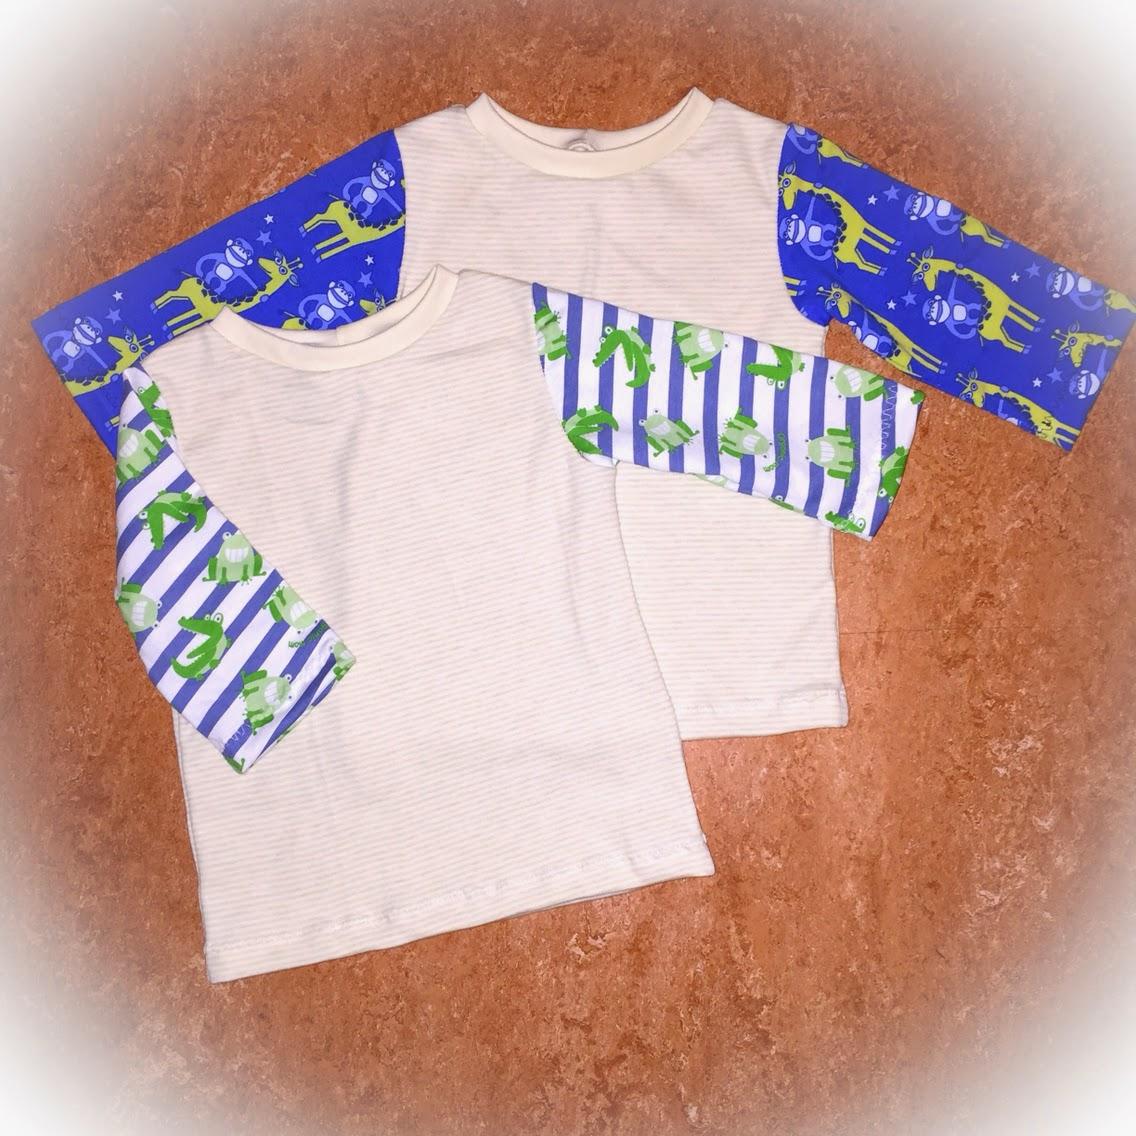 pyjamas tröja sy barnkläder inspiration